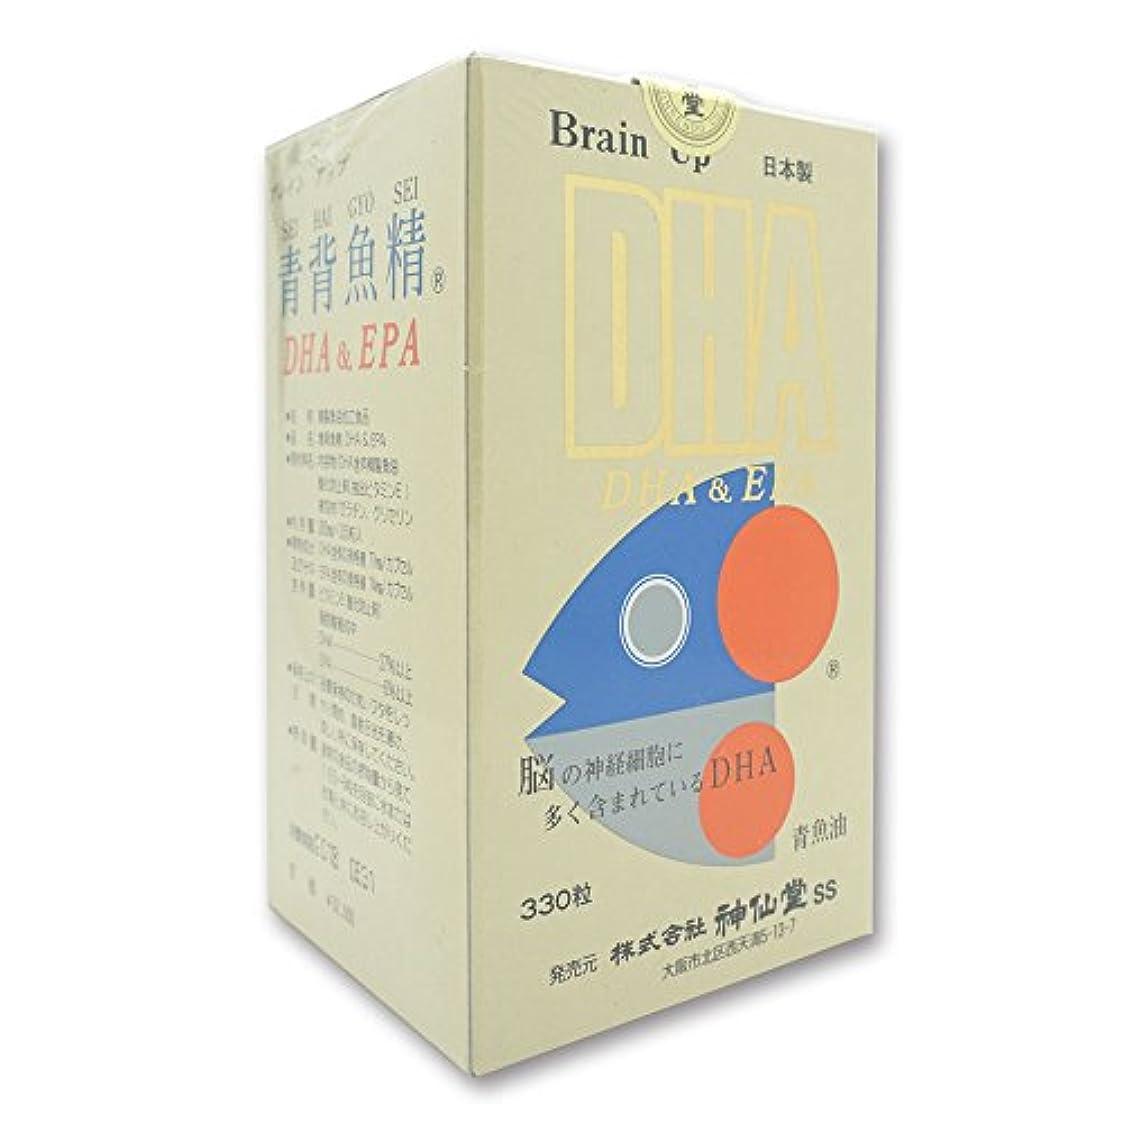 火薬ジョブ本能神仙堂 青背魚精 DHA&EPA 330粒 精製魚油加工食品